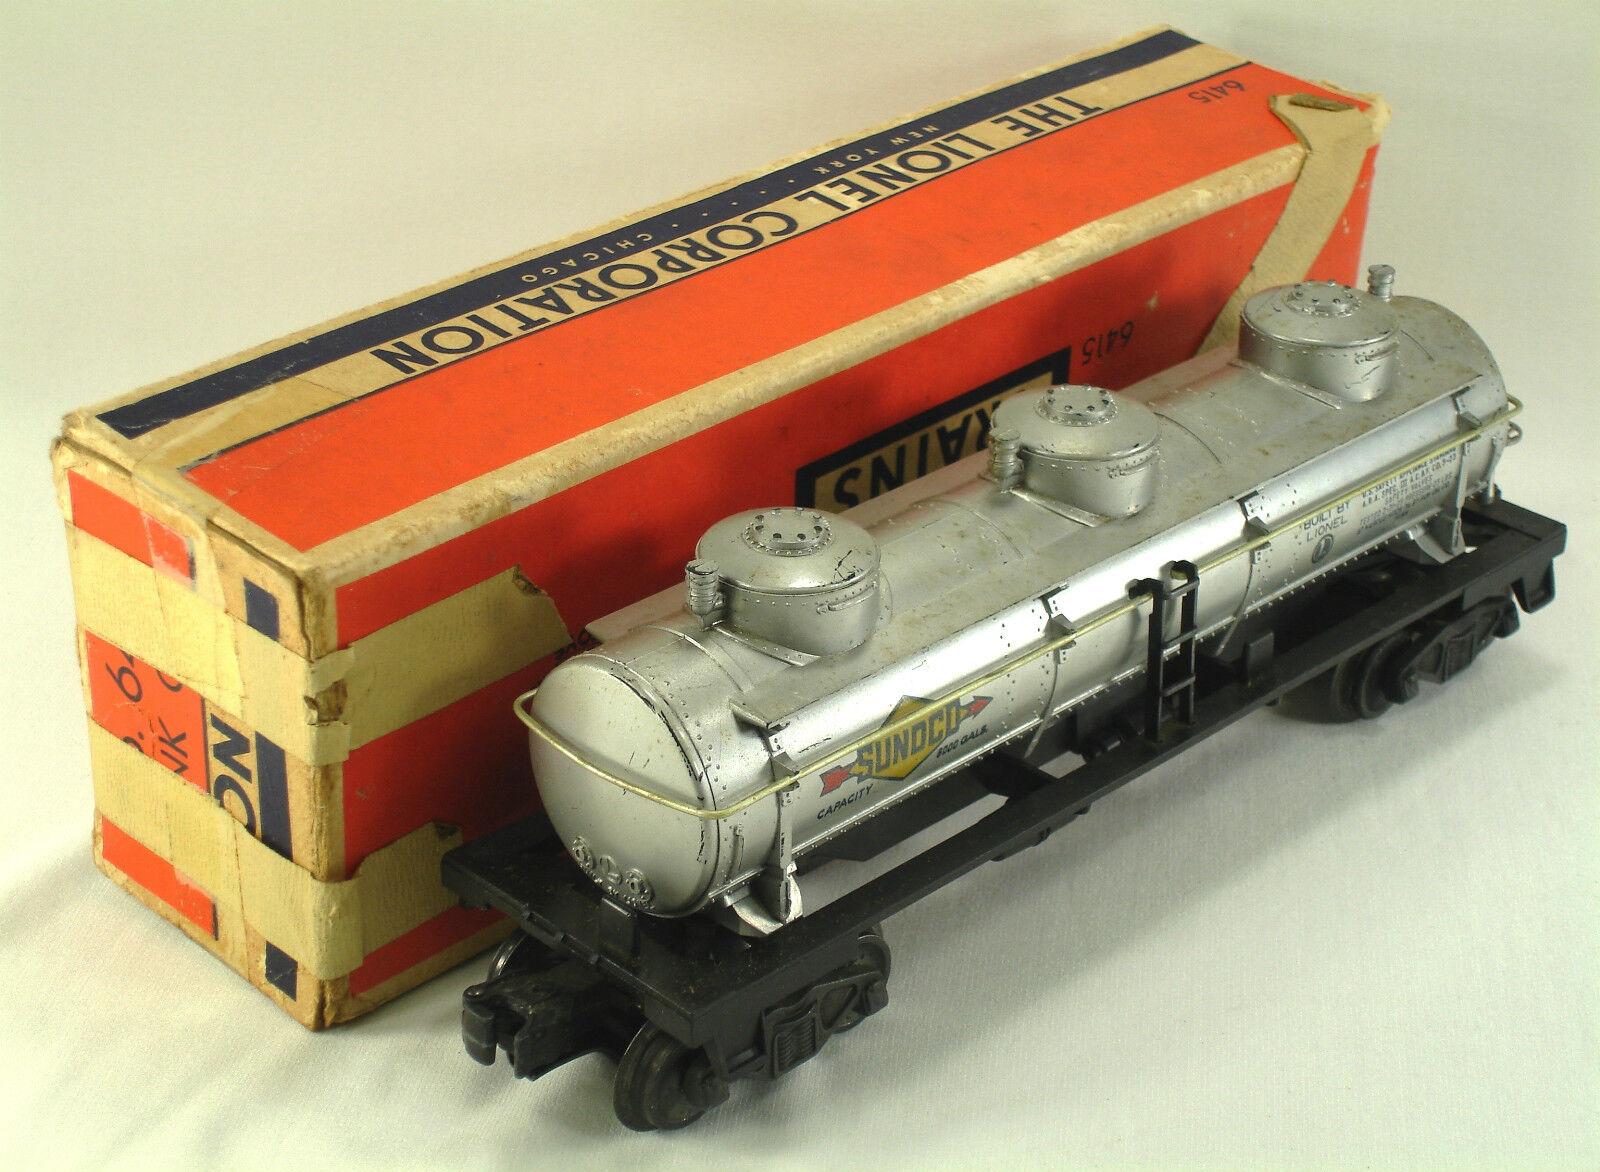 1953 LIONEL O GAUGE 6415 SUNOCO THREE-DOME TANK CAR w  ORIGINAL BOX (6415-18)